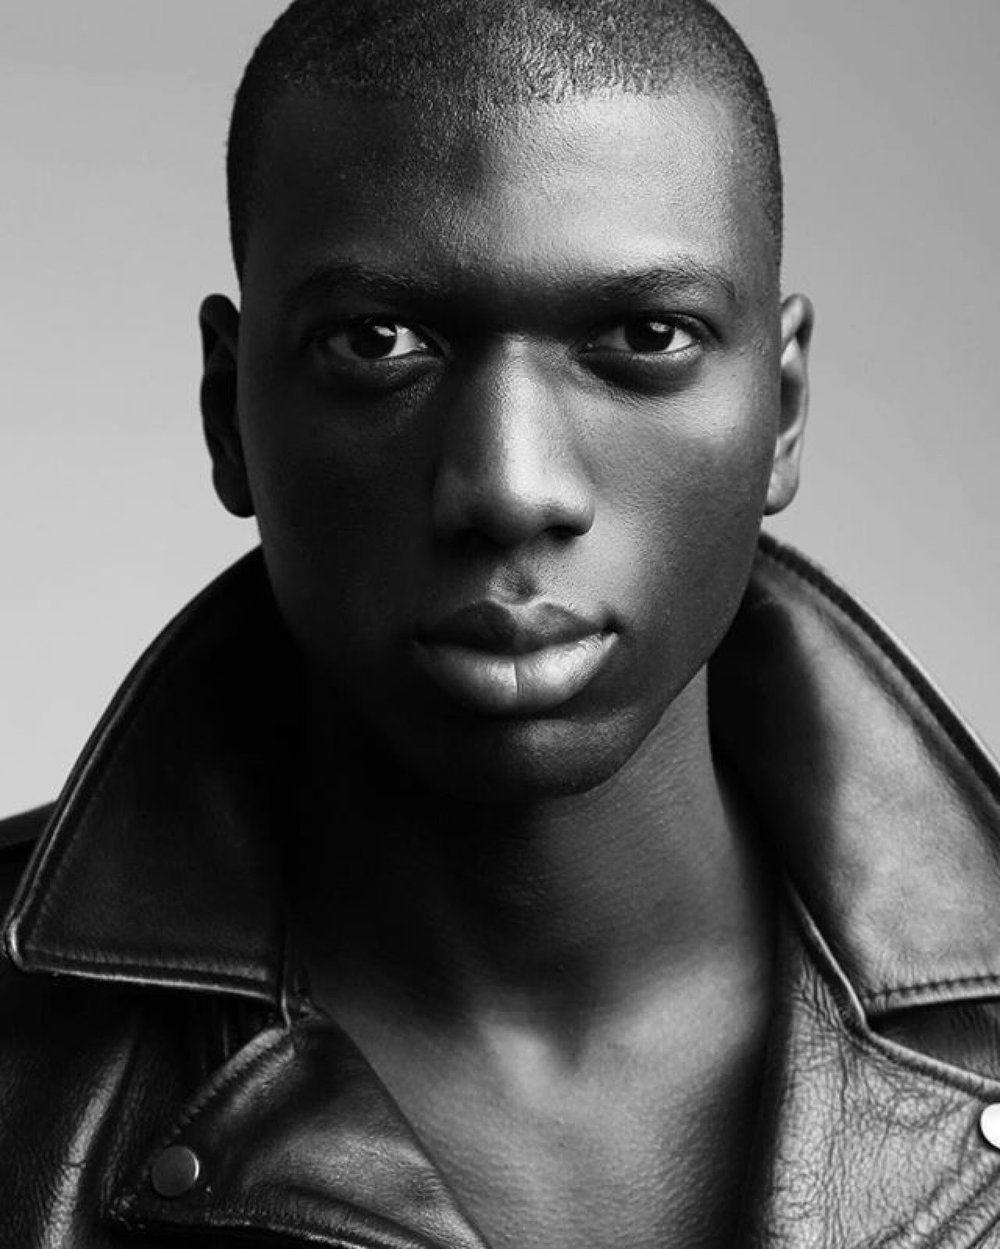 Fredrique W. - Sierra Leon/NYC